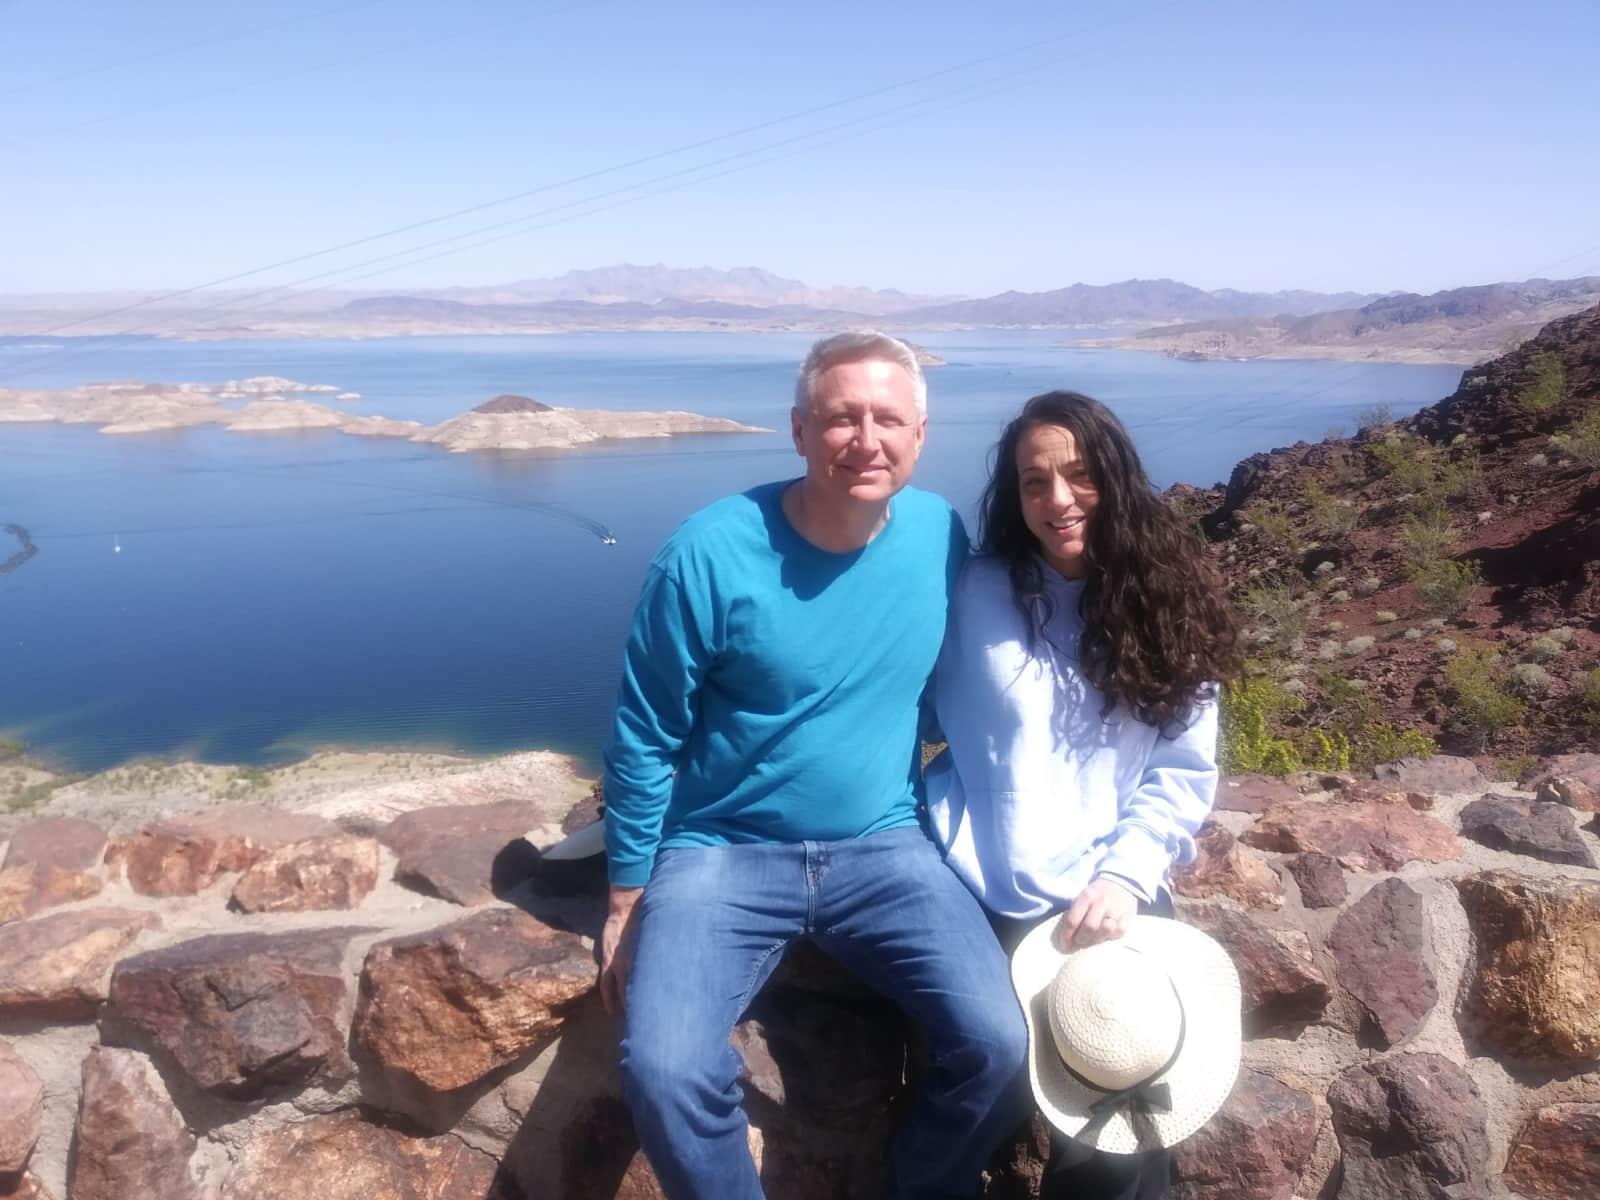 Mark and patricia & Mark from Seattle, Washington, United States